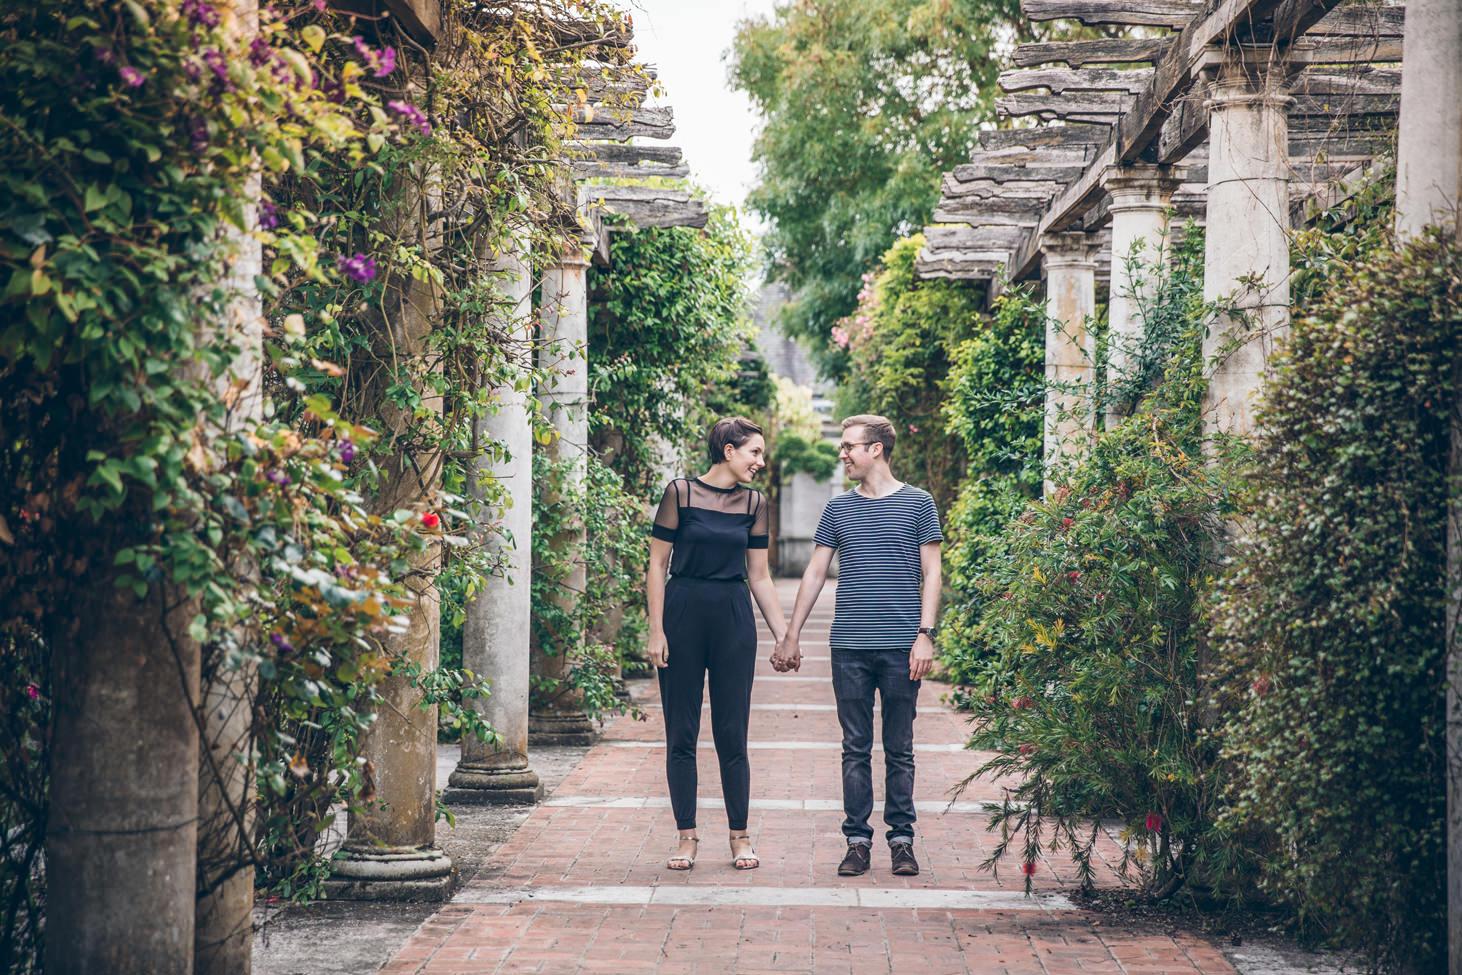 sarah ann wright hamsptead hill gardens engagement